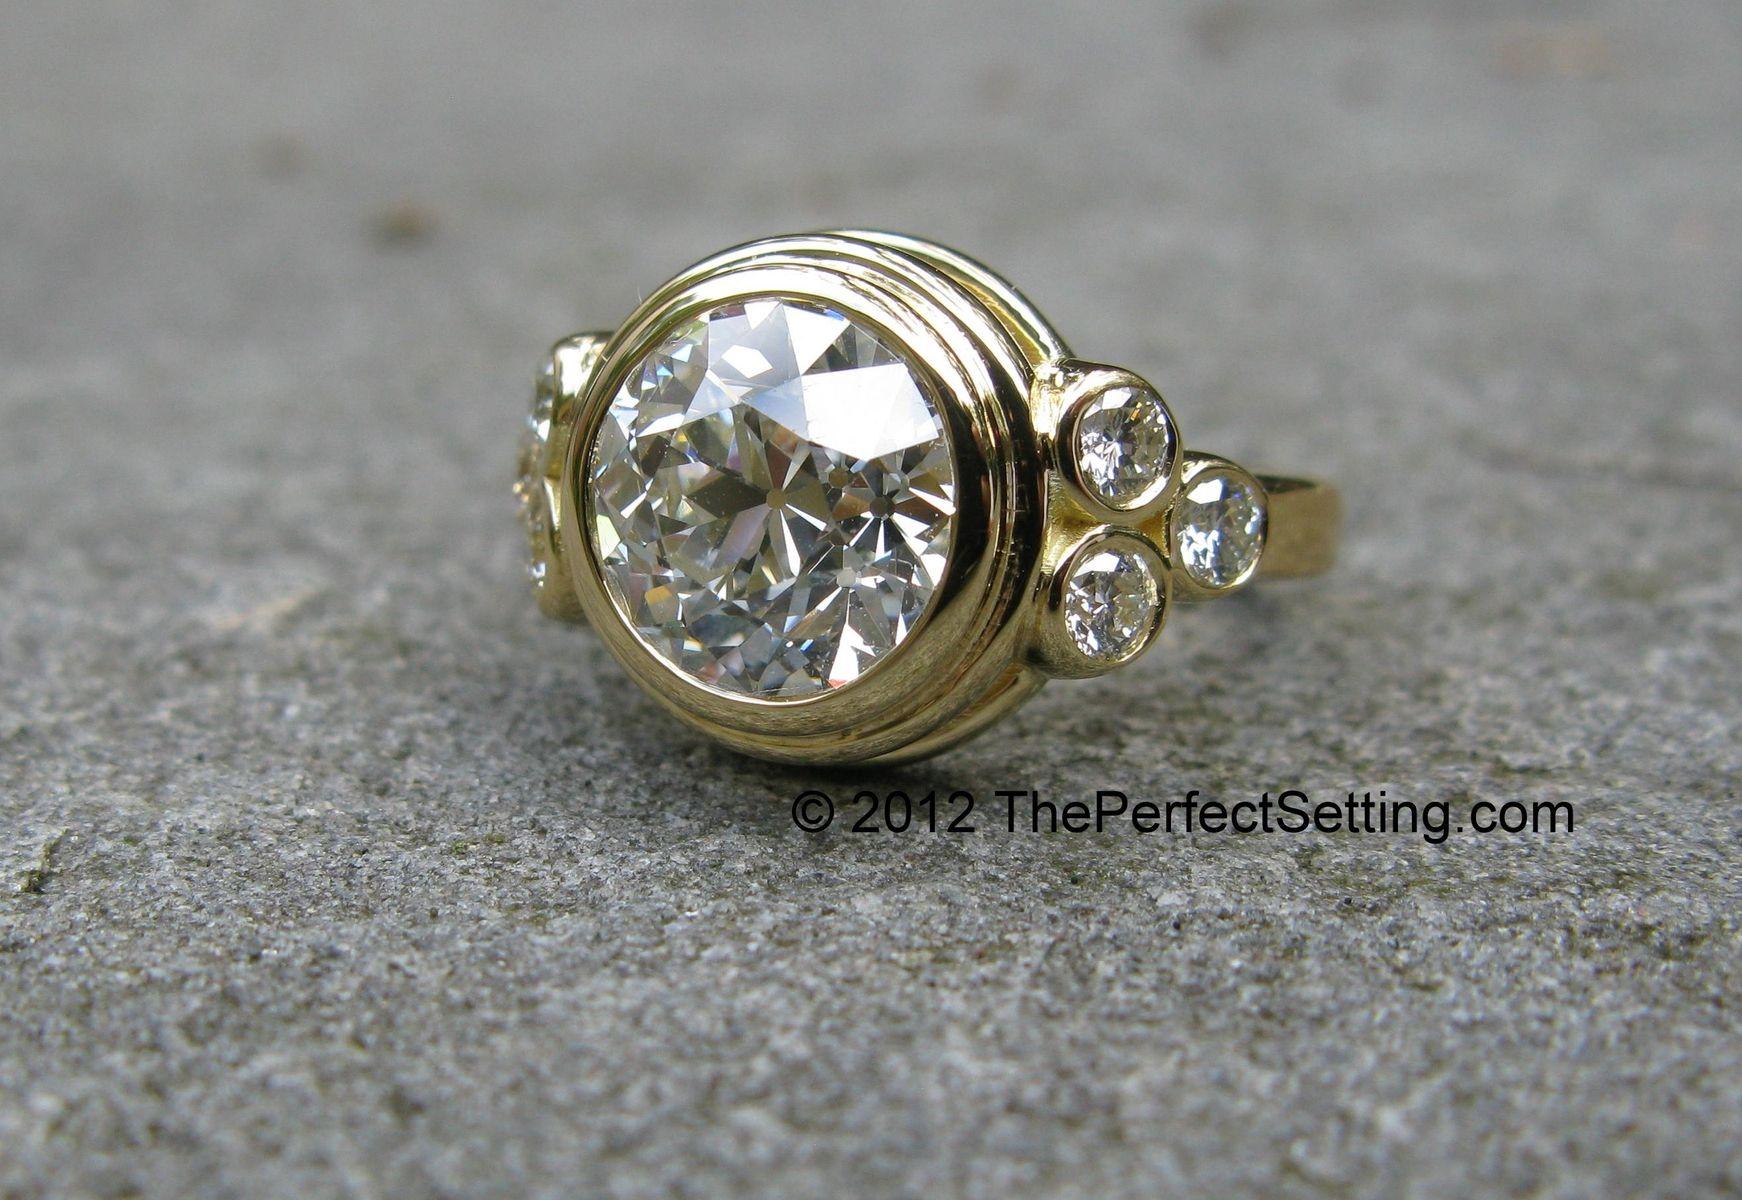 handmade custom gold and diamond engagement anniversary. Black Bedroom Furniture Sets. Home Design Ideas